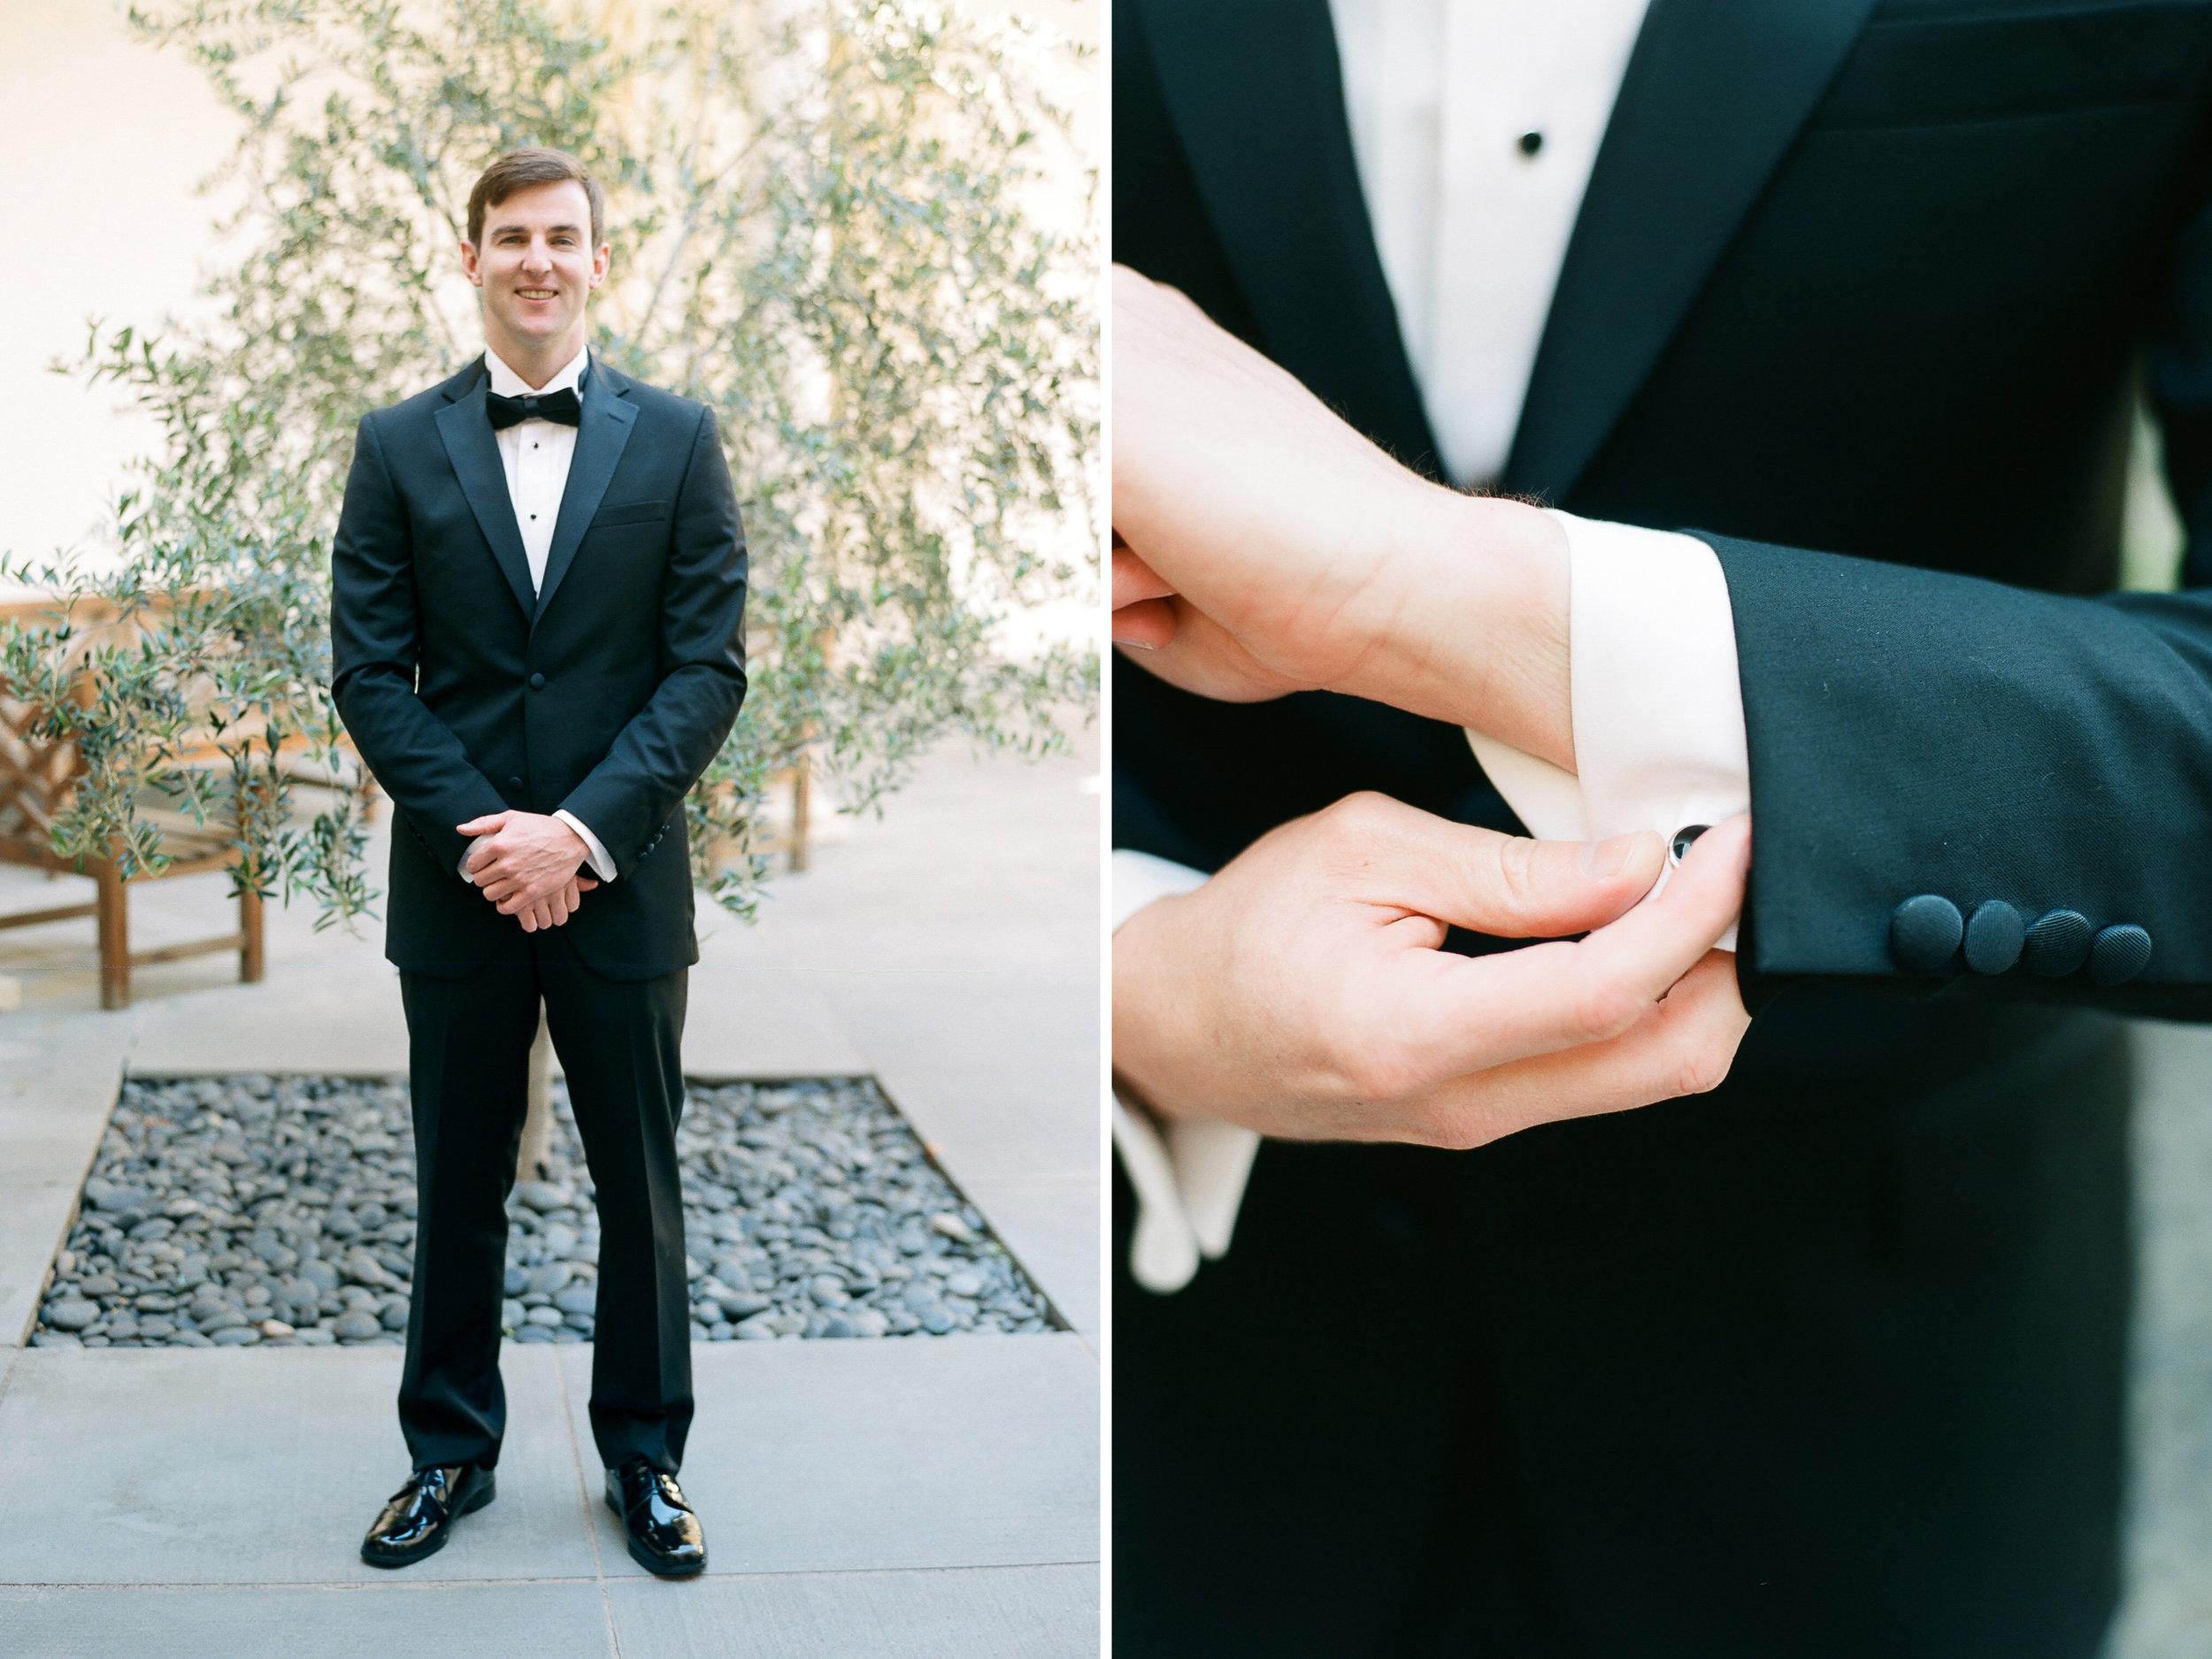 St.-Philip-Presbyterian-Church-Houston-Wedding-Ceremony-The-Junior-League-Of-Houston-Reception-Dana-Fernandez-Photography-Fine-Art-Film-105.jpg